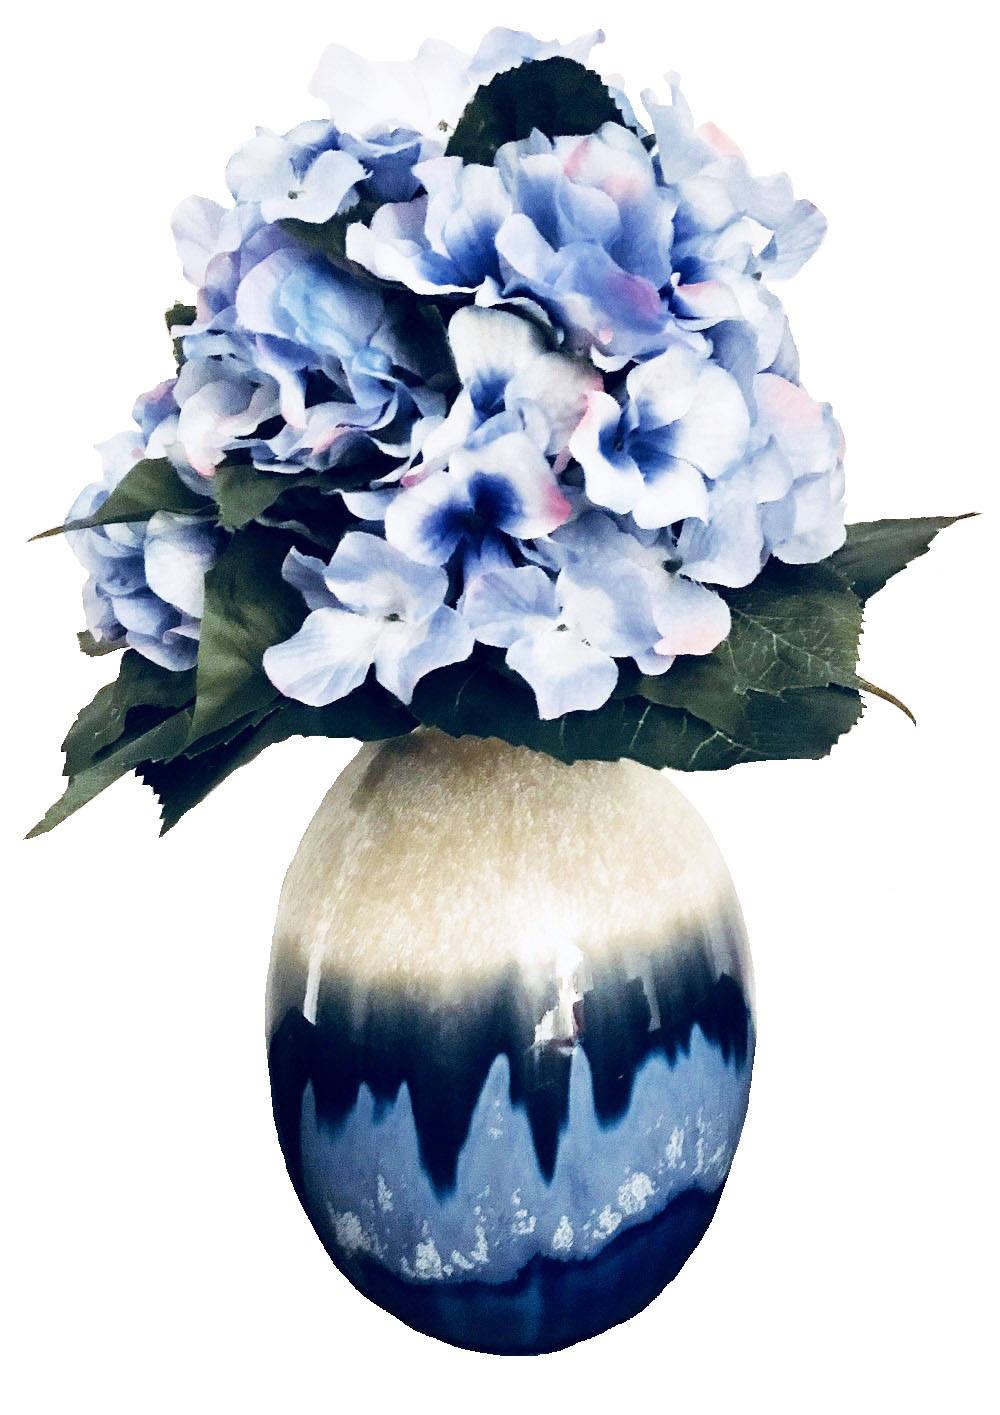 Blue hydrangeas silk floral arrangement handmade silk flowers blue hydrangeas silk floral arrangement handmade silk flowers etsy home decor mothers day birthday gift gift idea etsy seller mightylinksfo